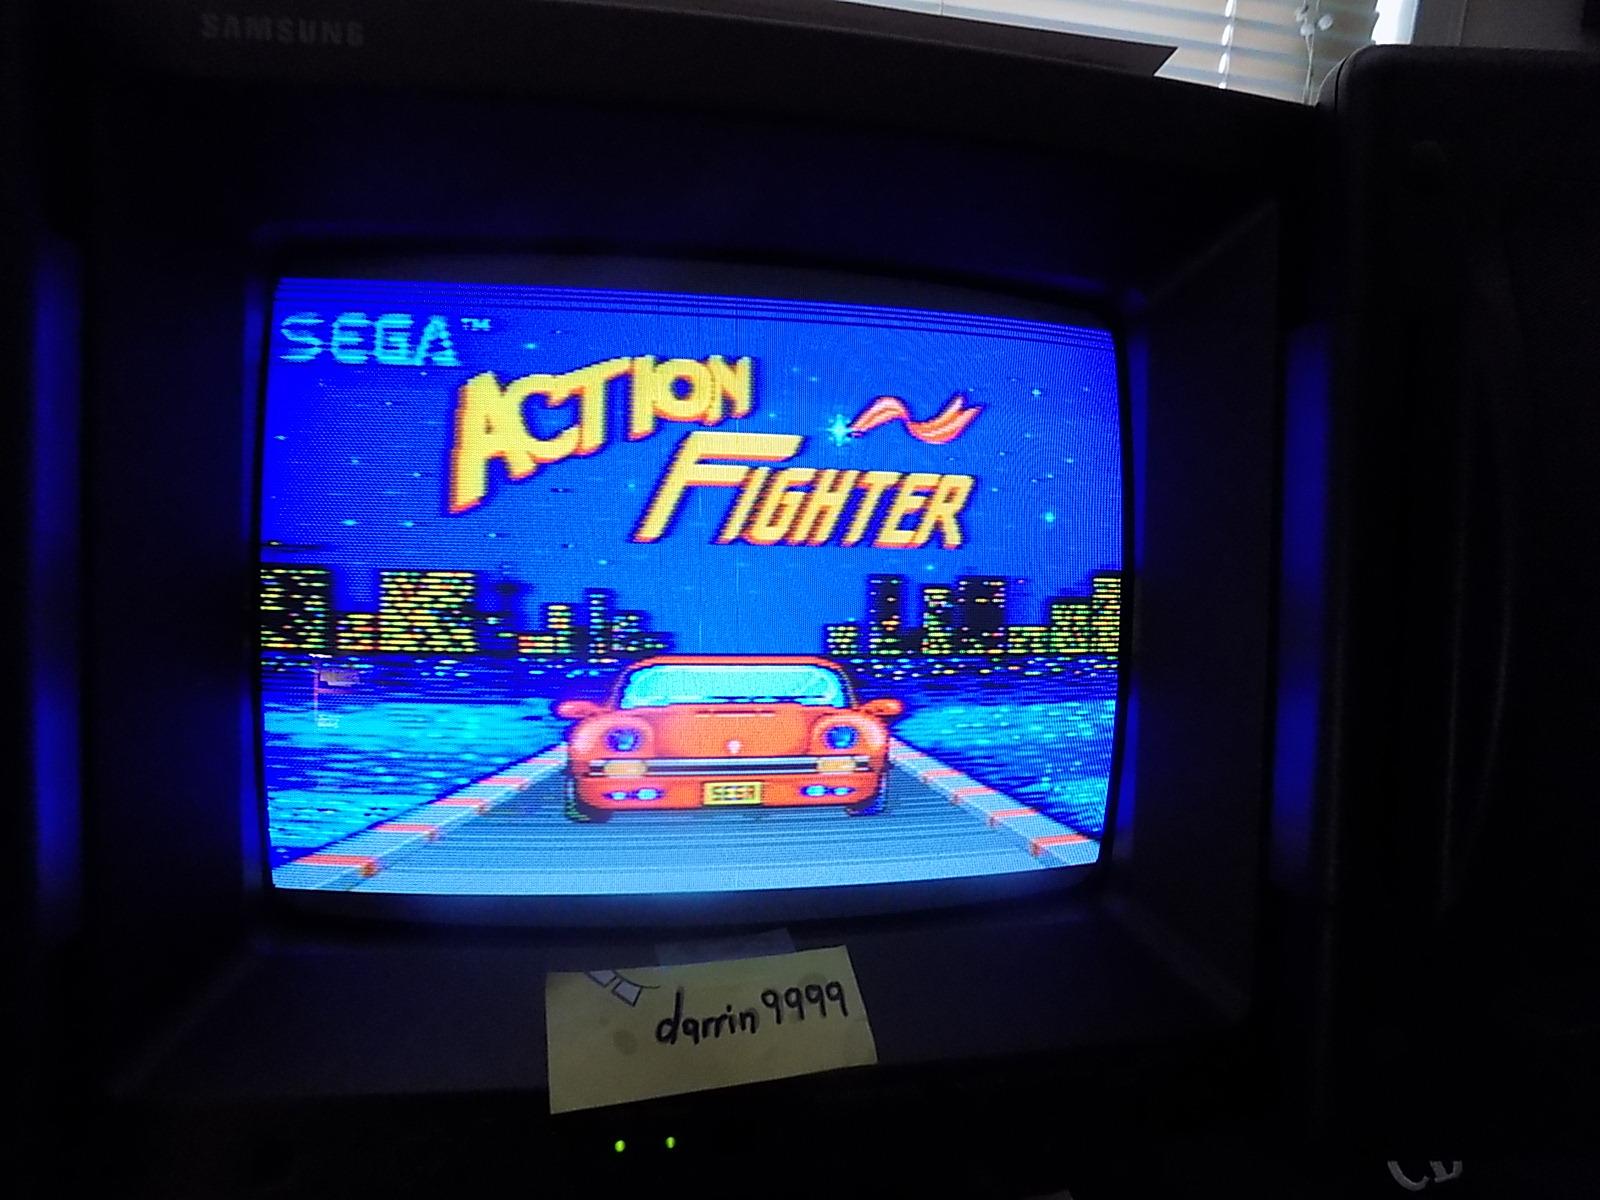 darrin9999: Action Fighter (Atari Jaguar) 13,700 points on 2019-12-25 11:15:12